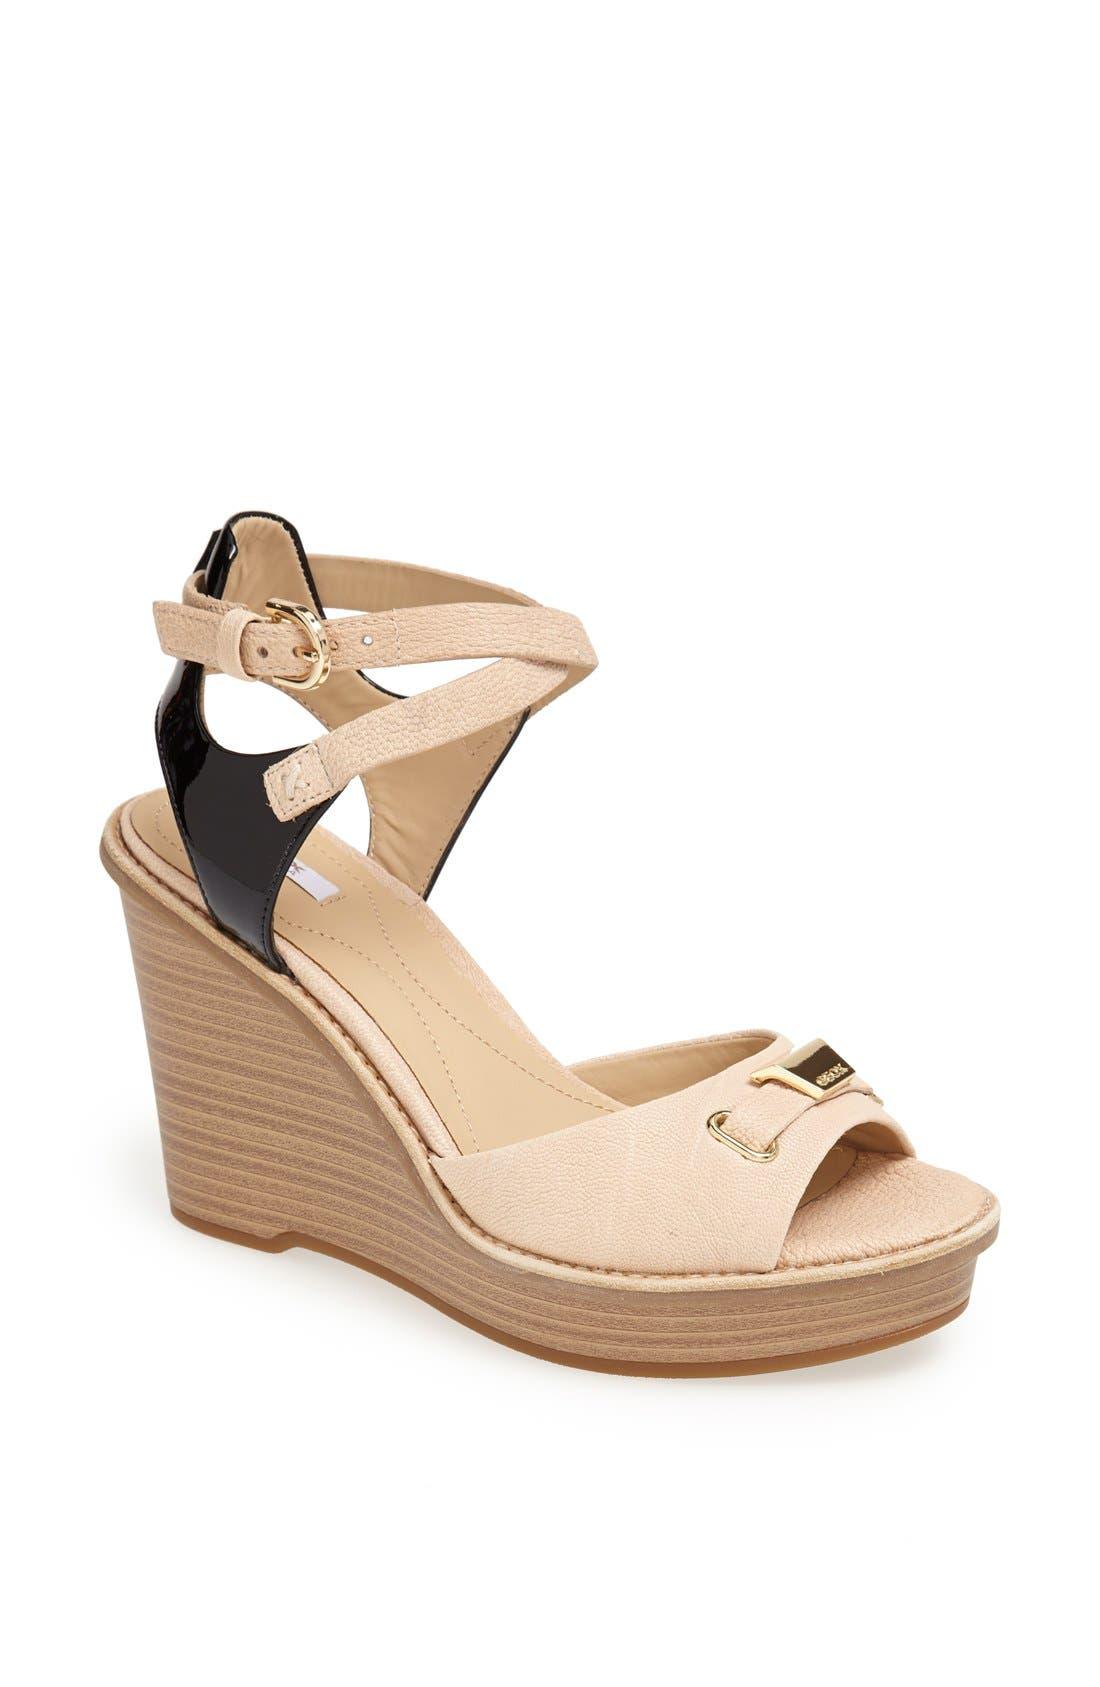 Alternate Image 1 Selected - Geox 'Maranta' Wedge Sandal